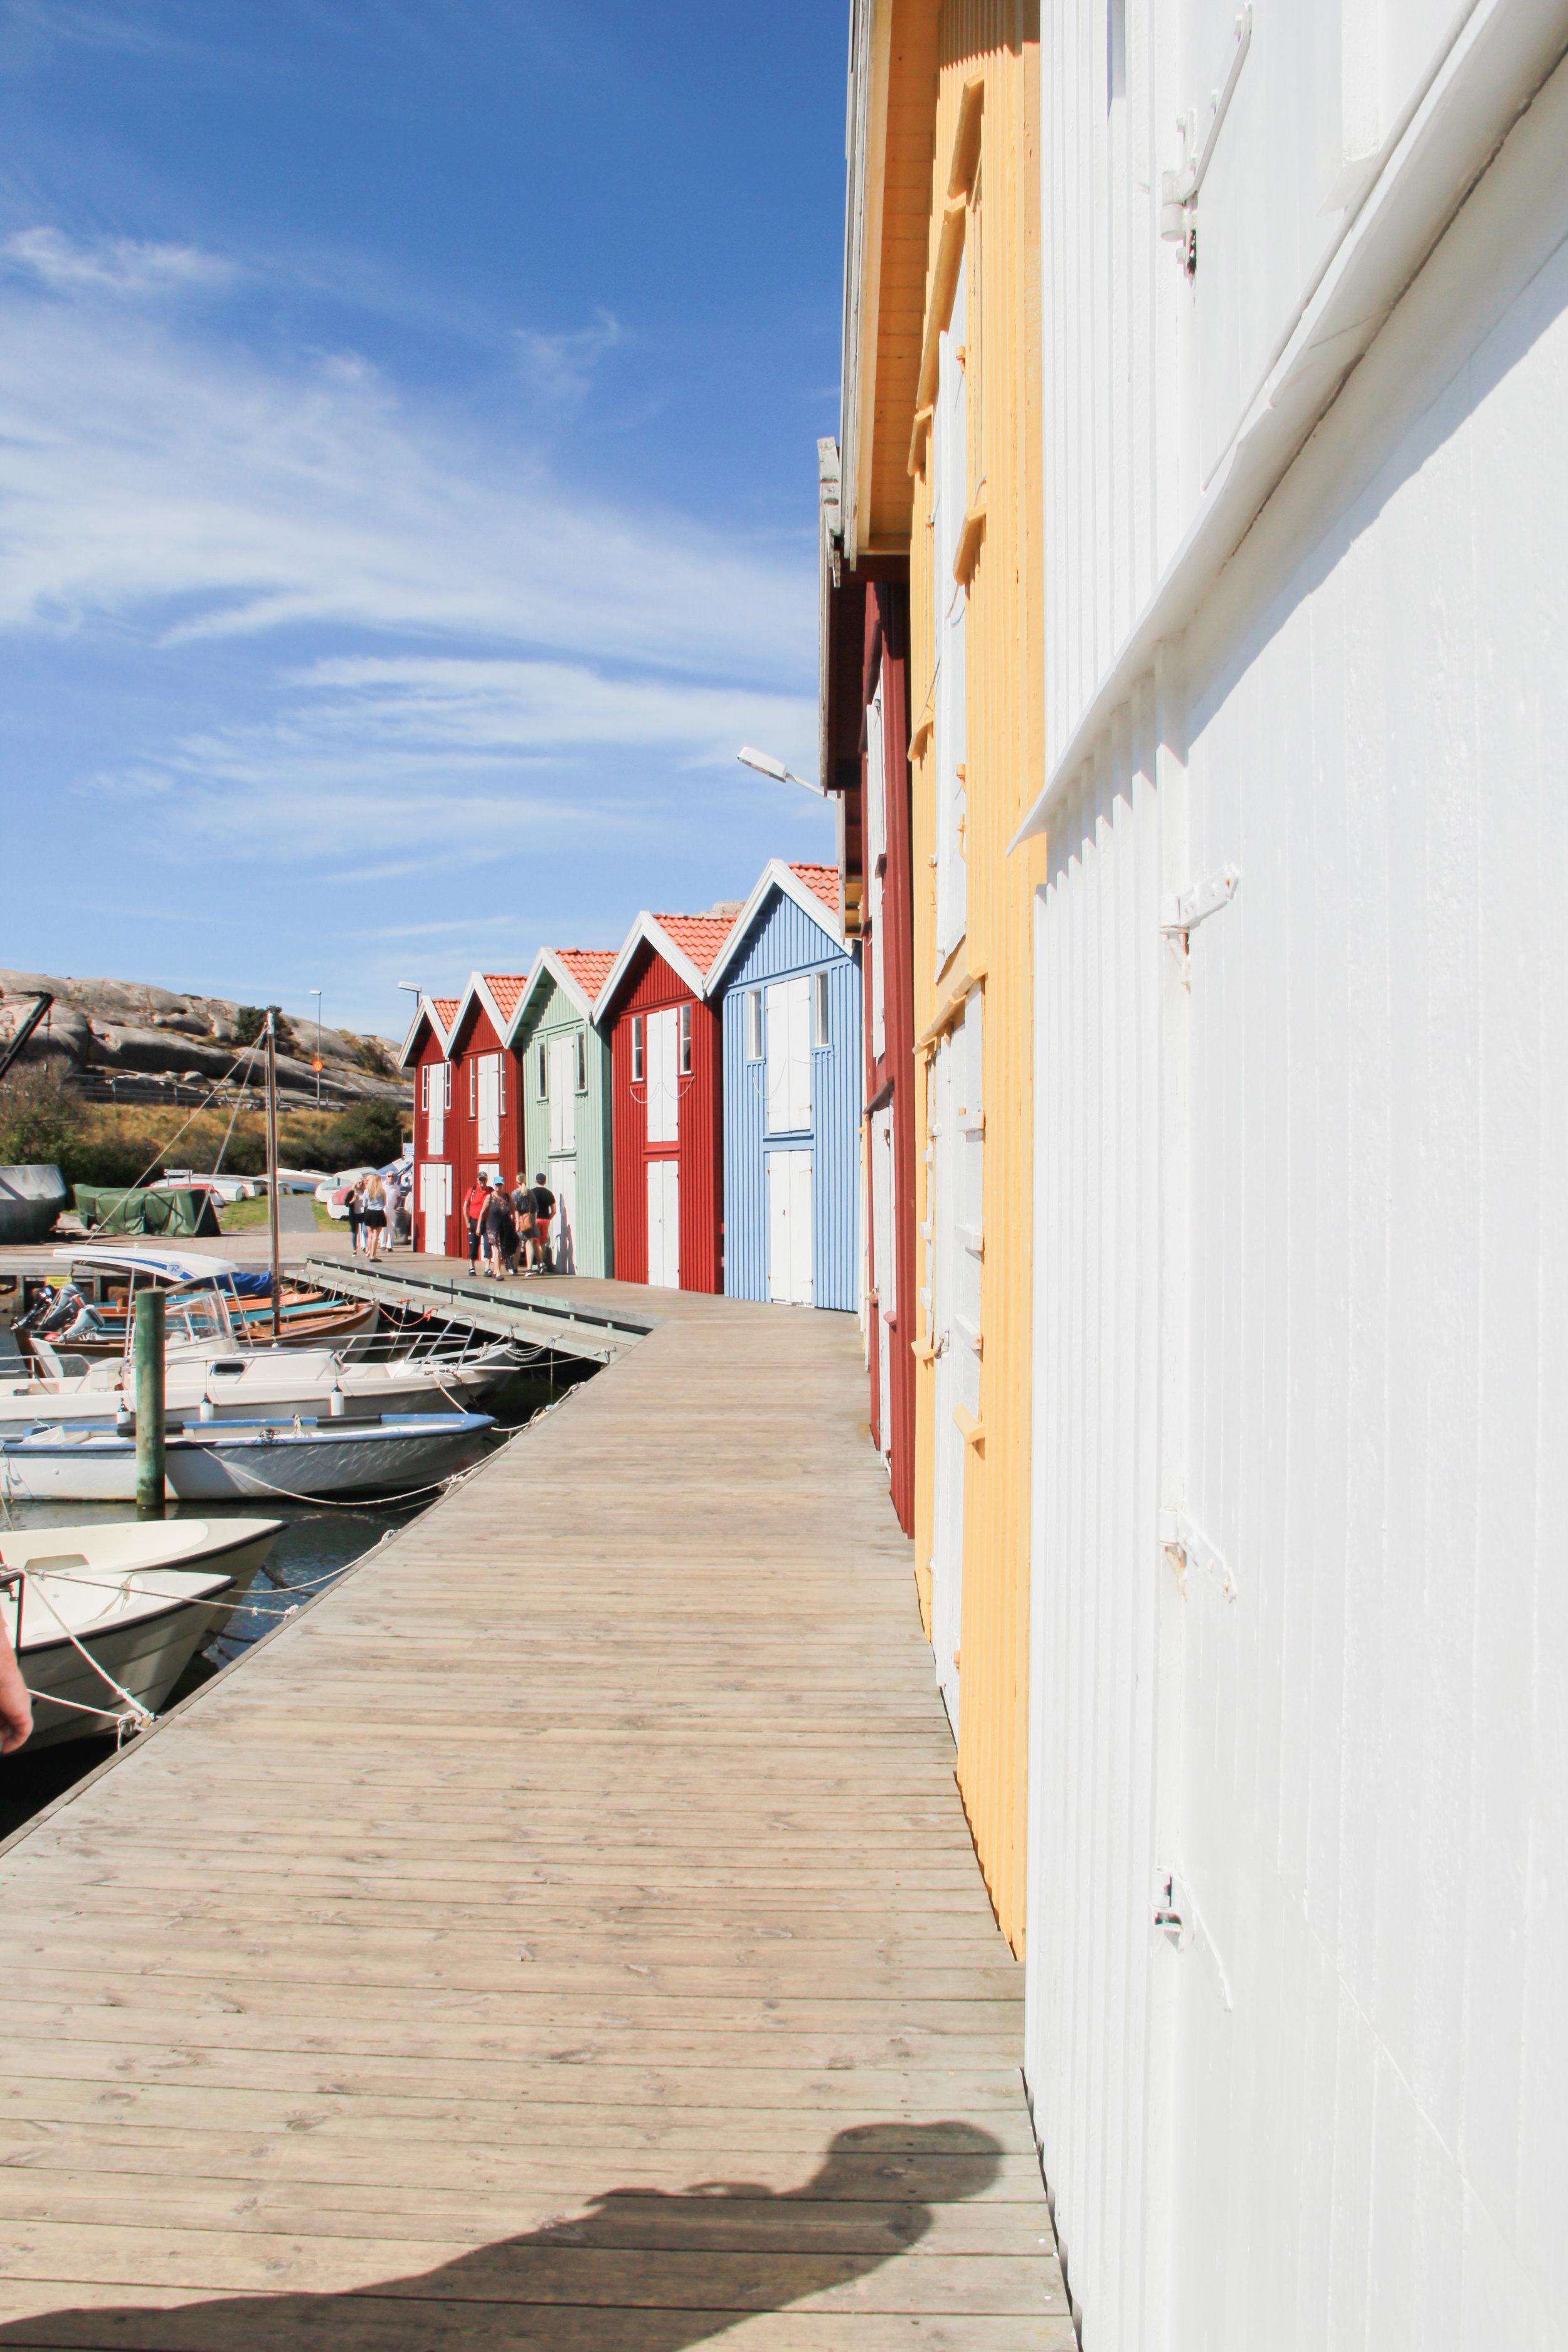 Bohulsan Coast Where the Swedes Summer-41.jpg